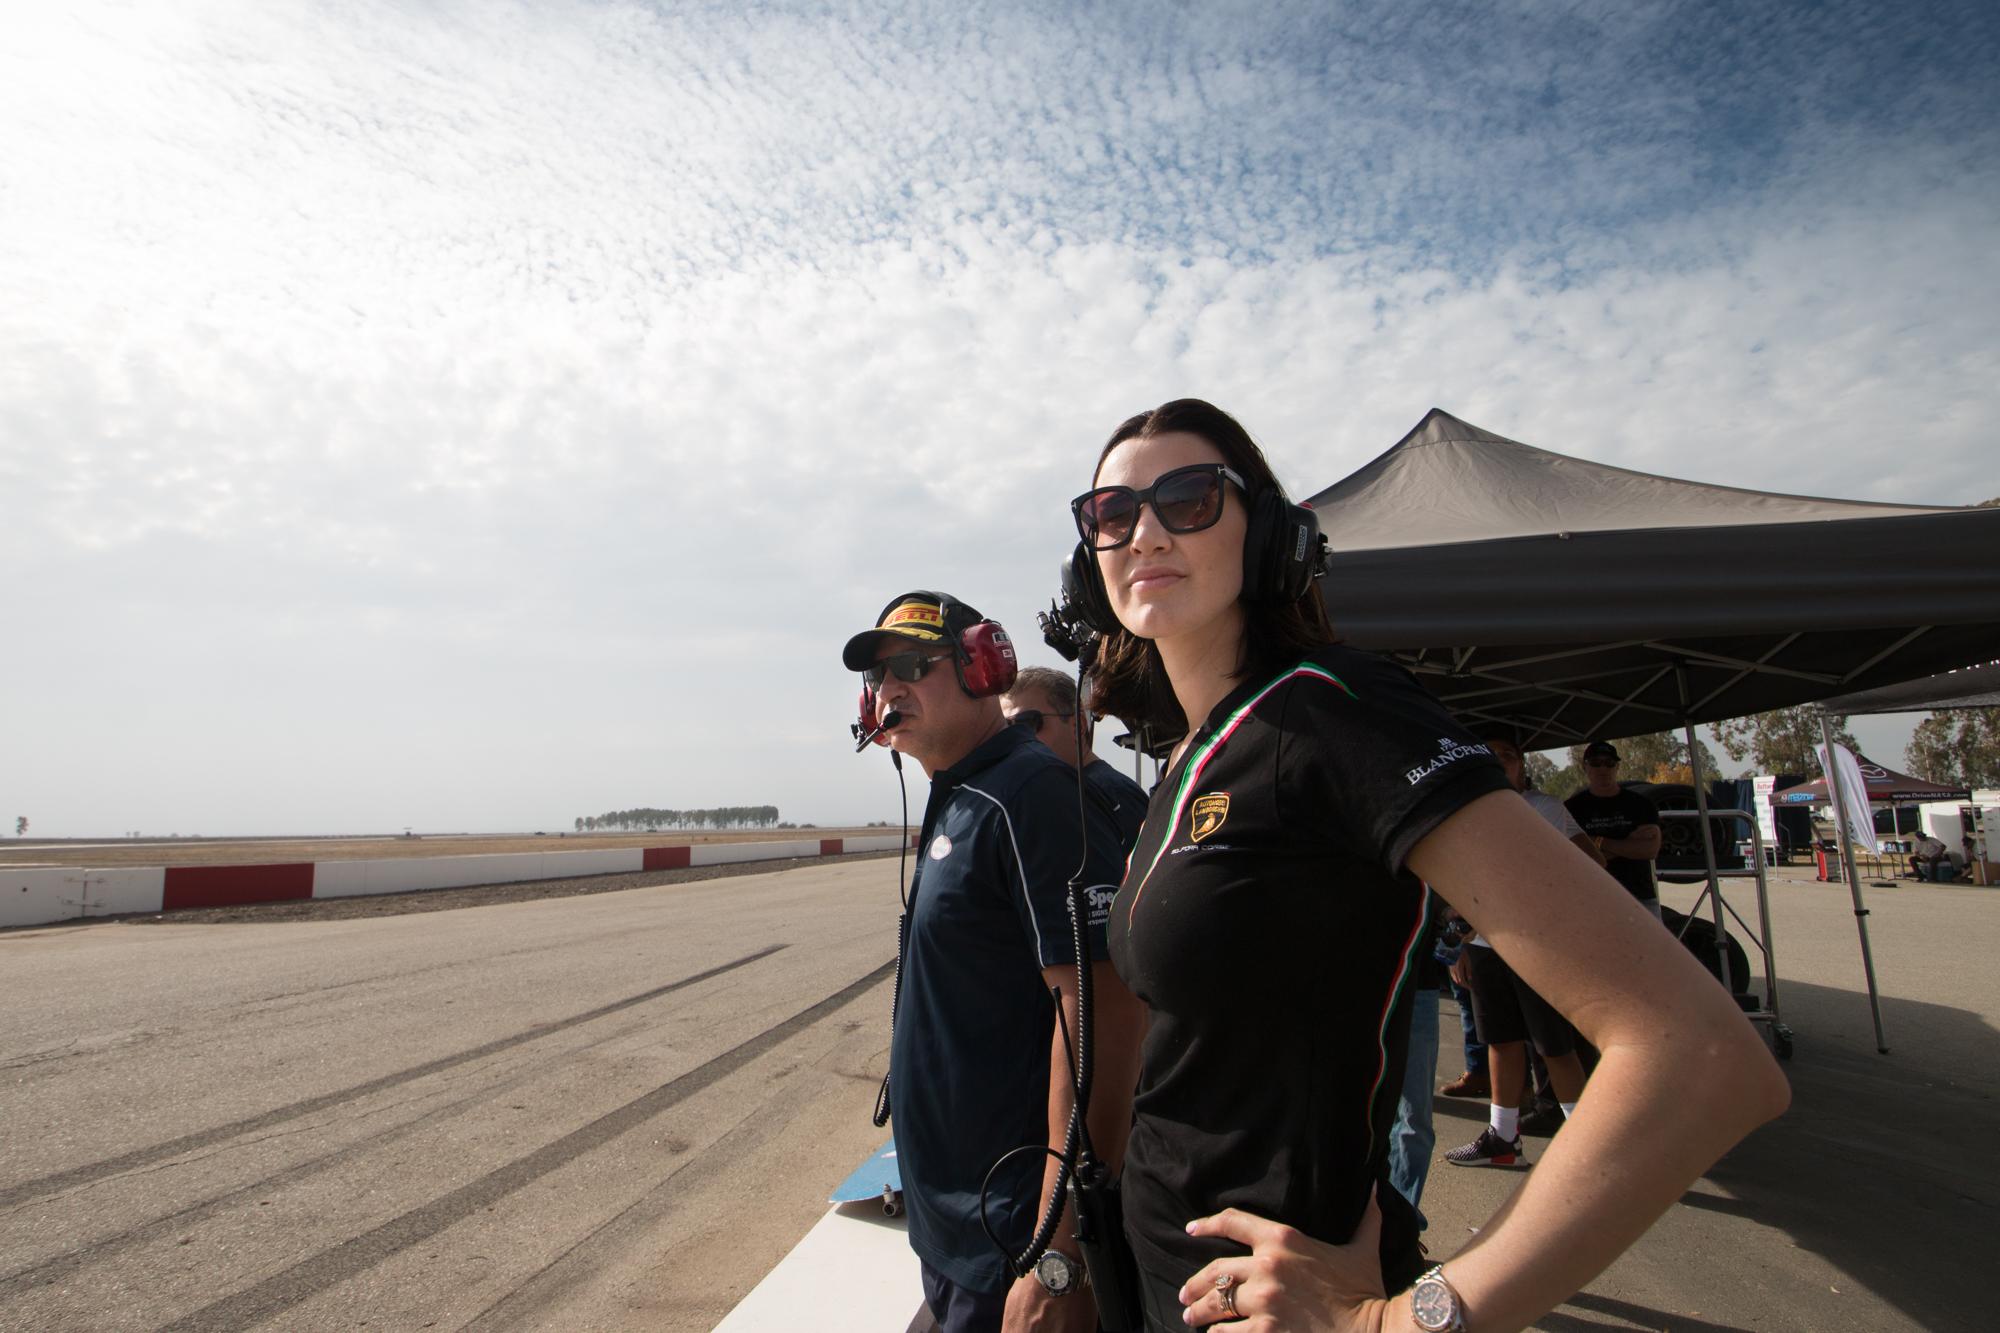 Steven-Racing-20130301-55532.jpg